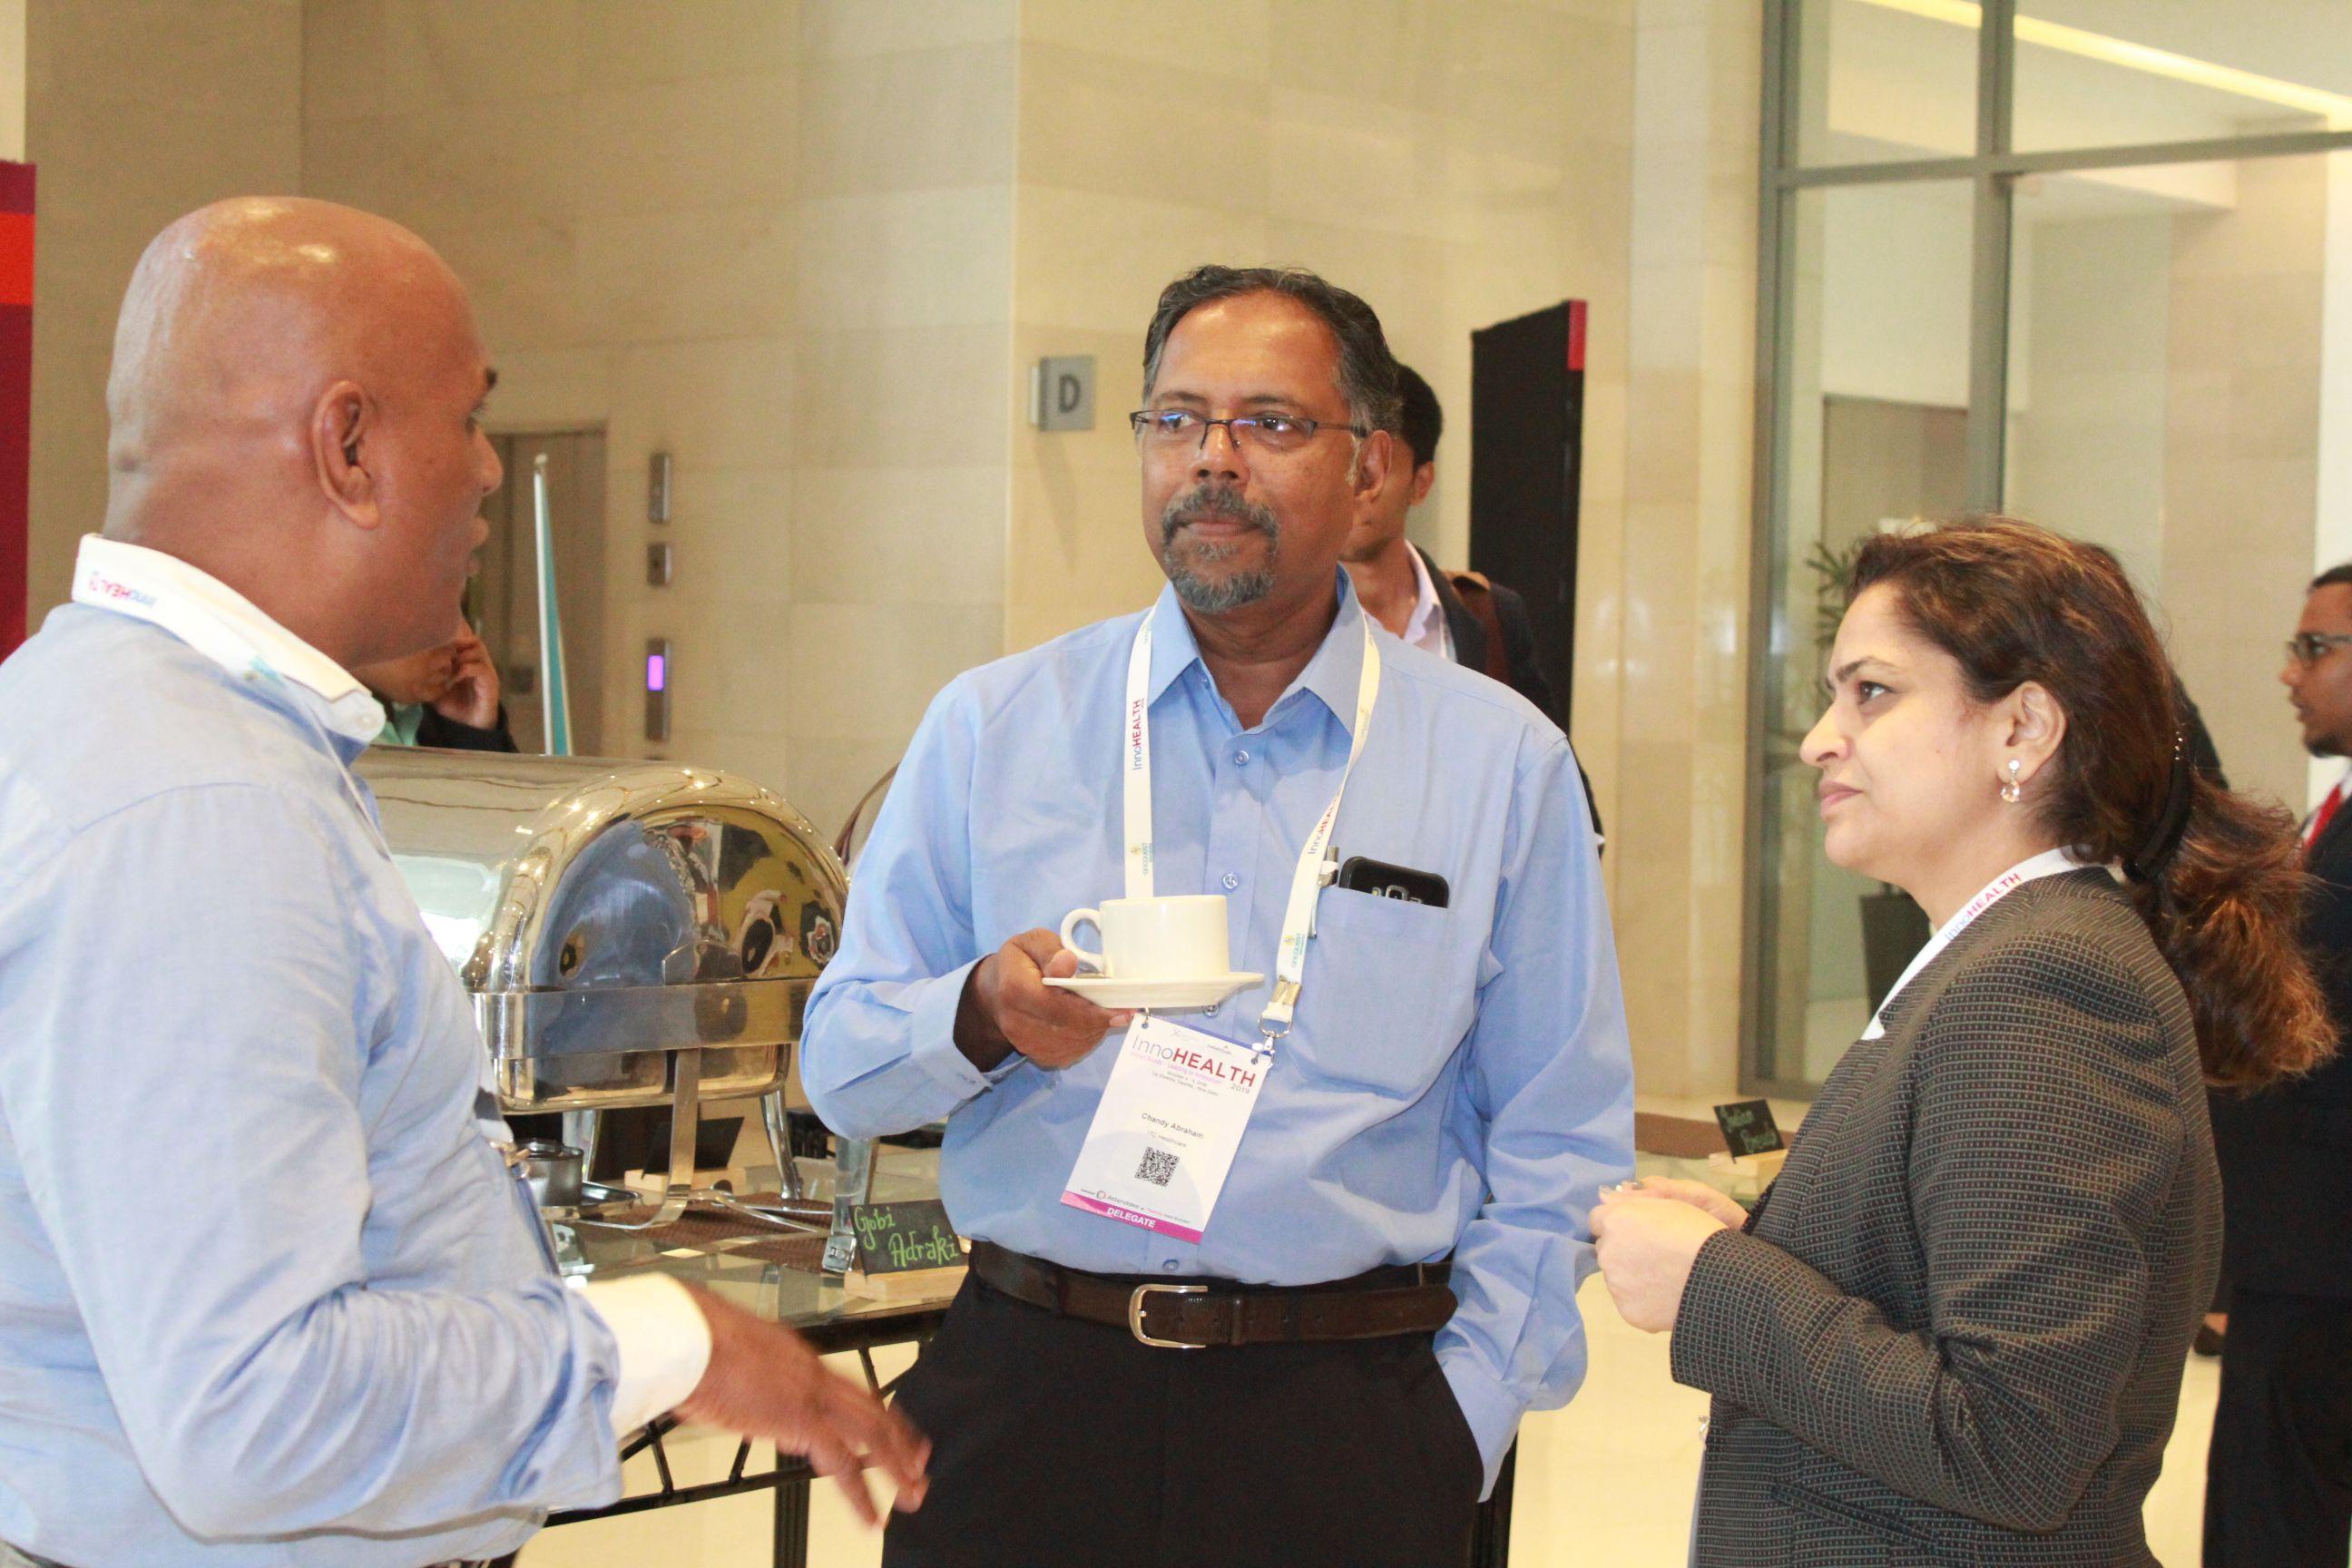 Dr. Tapan Shah, Chandy Abraham and Dr. Shahikala at InnoHEALTH 2019